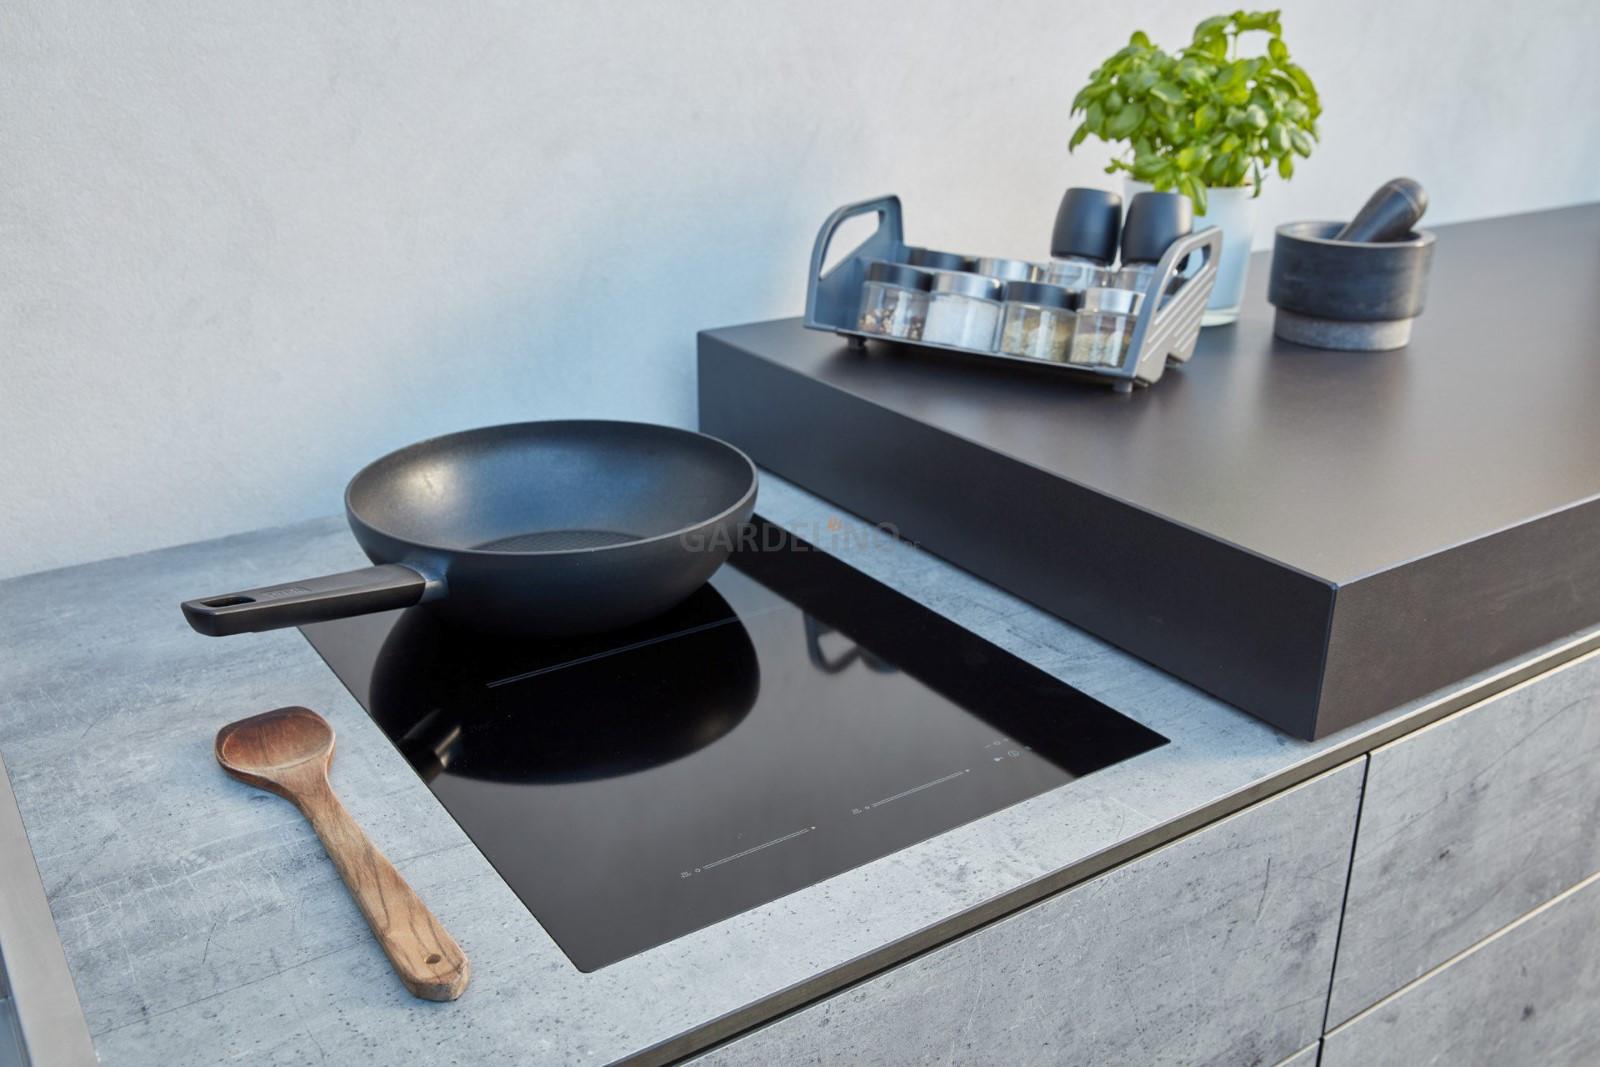 Outdoorküche Tür Anleitung : Gartenküche selber bauen anleitung und tipps